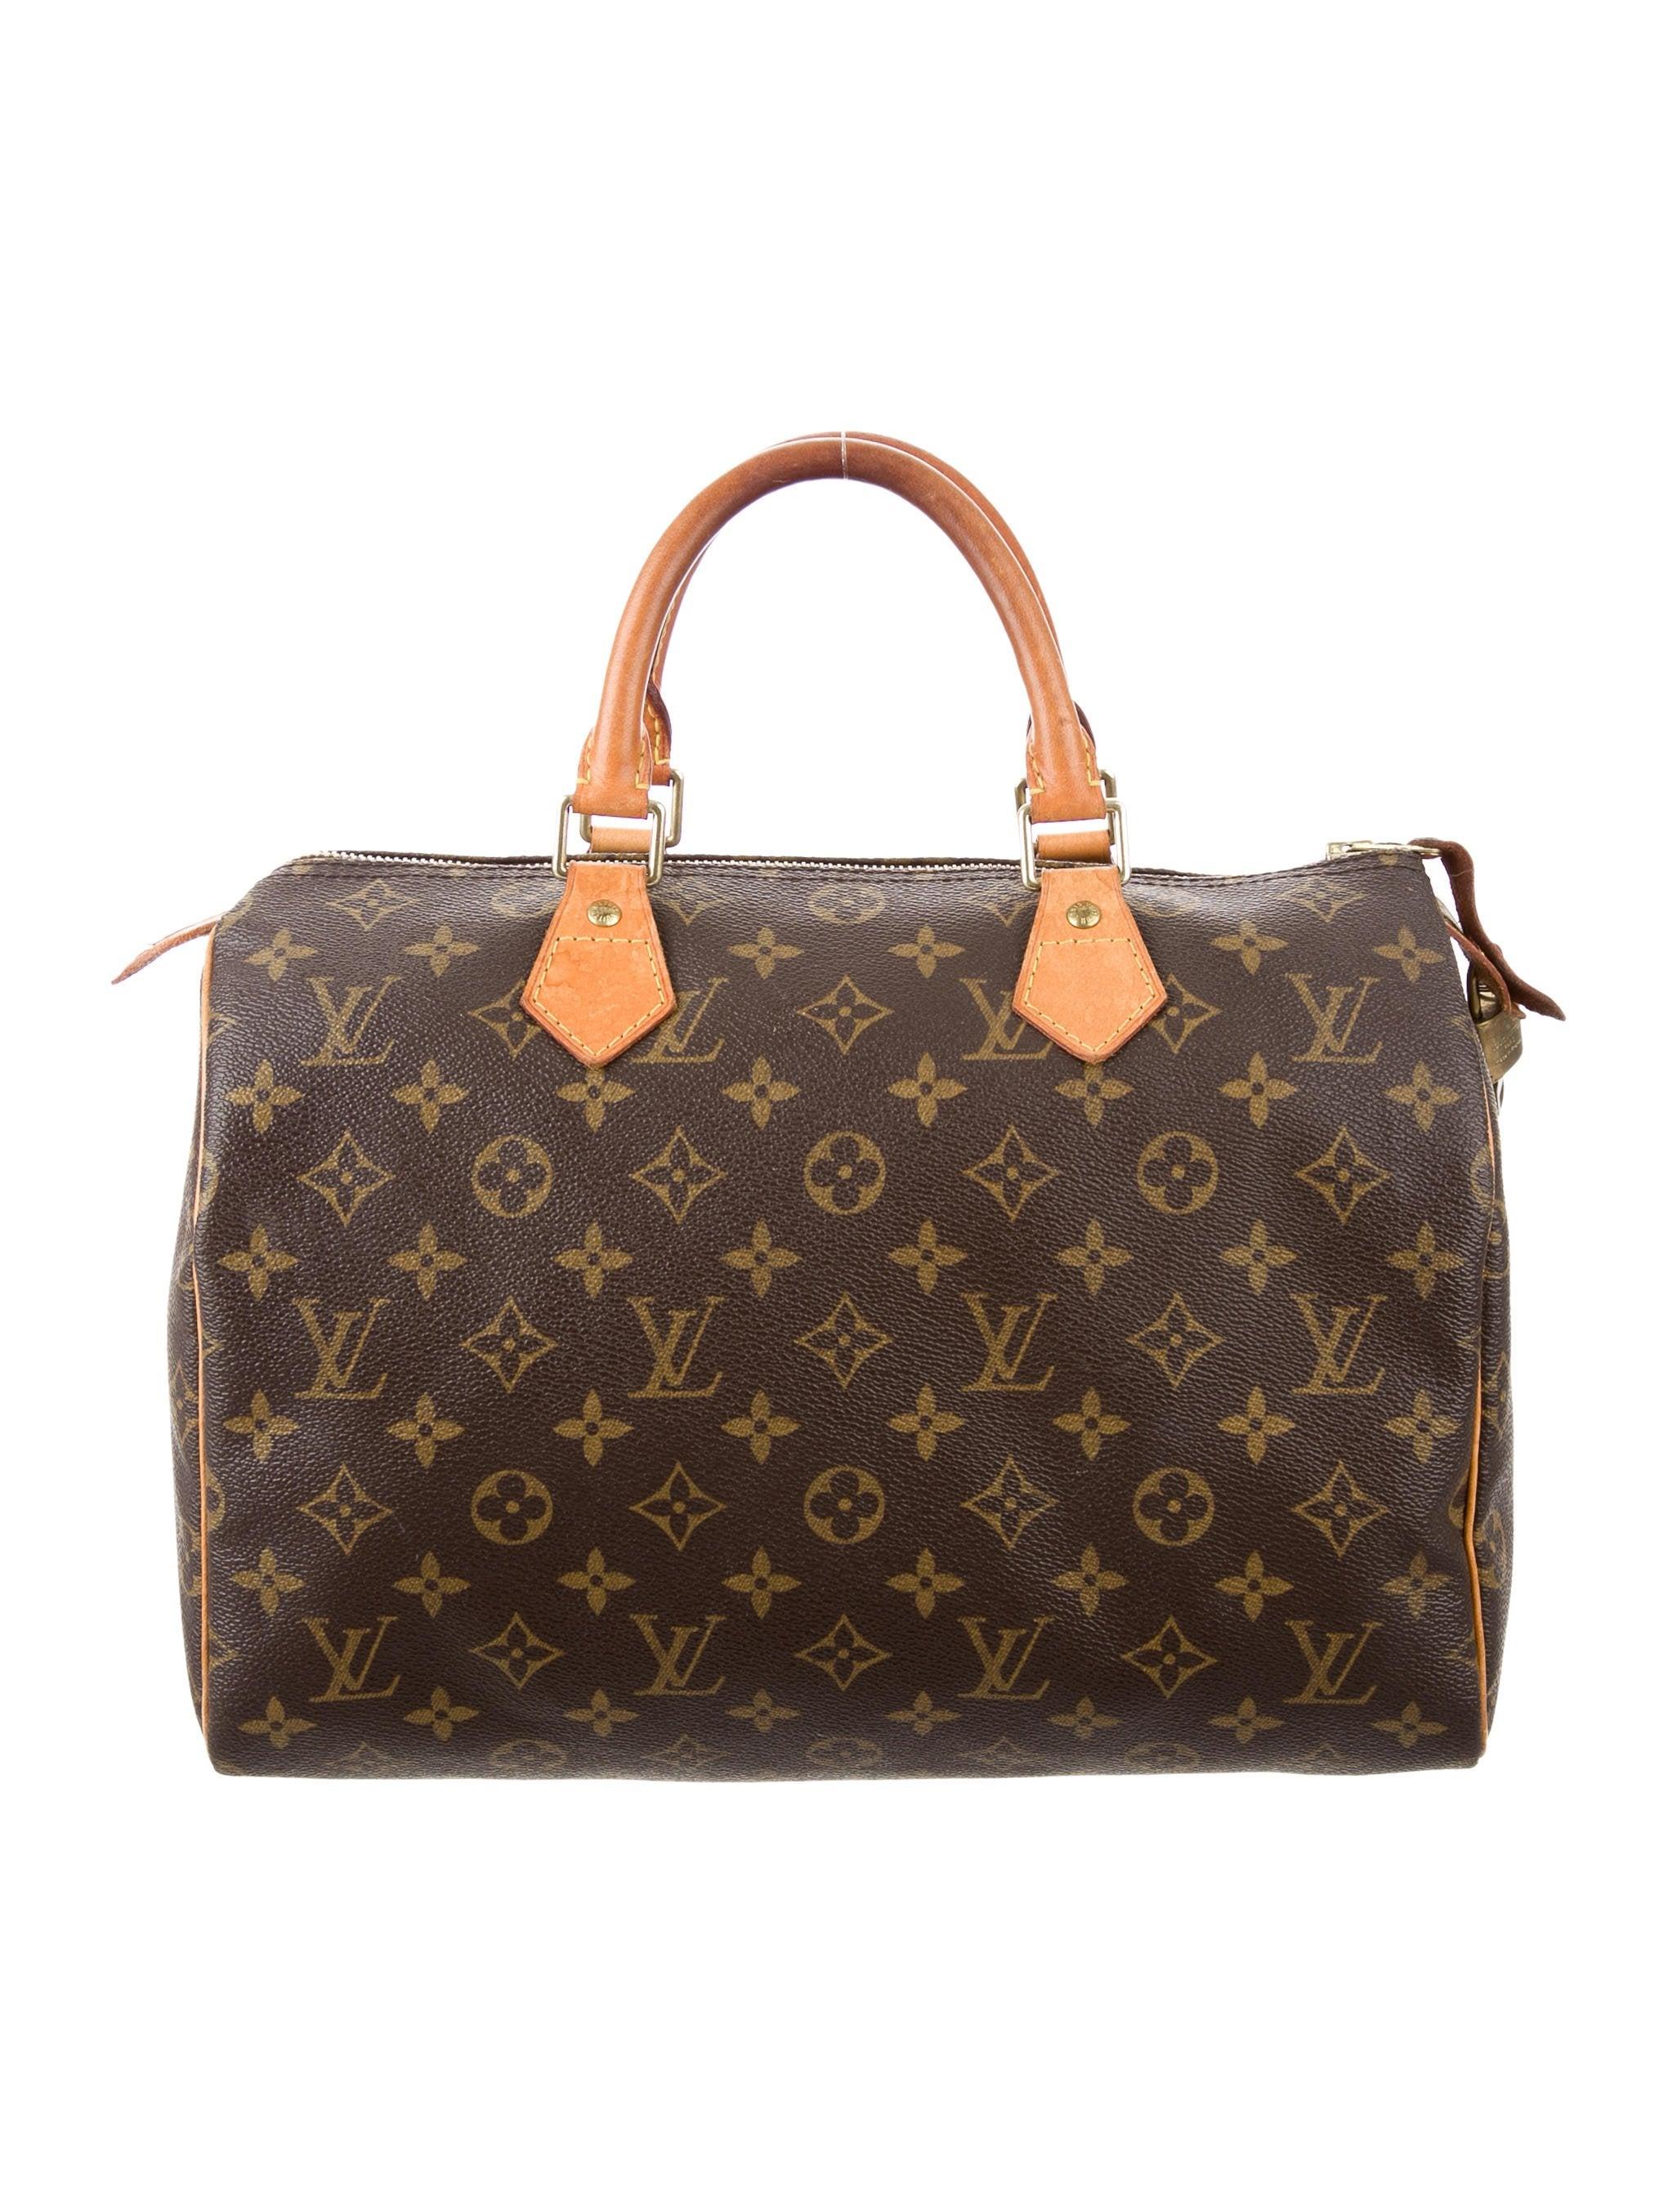 louis vuitton monogram speedy 30 handbags lou125894. Black Bedroom Furniture Sets. Home Design Ideas